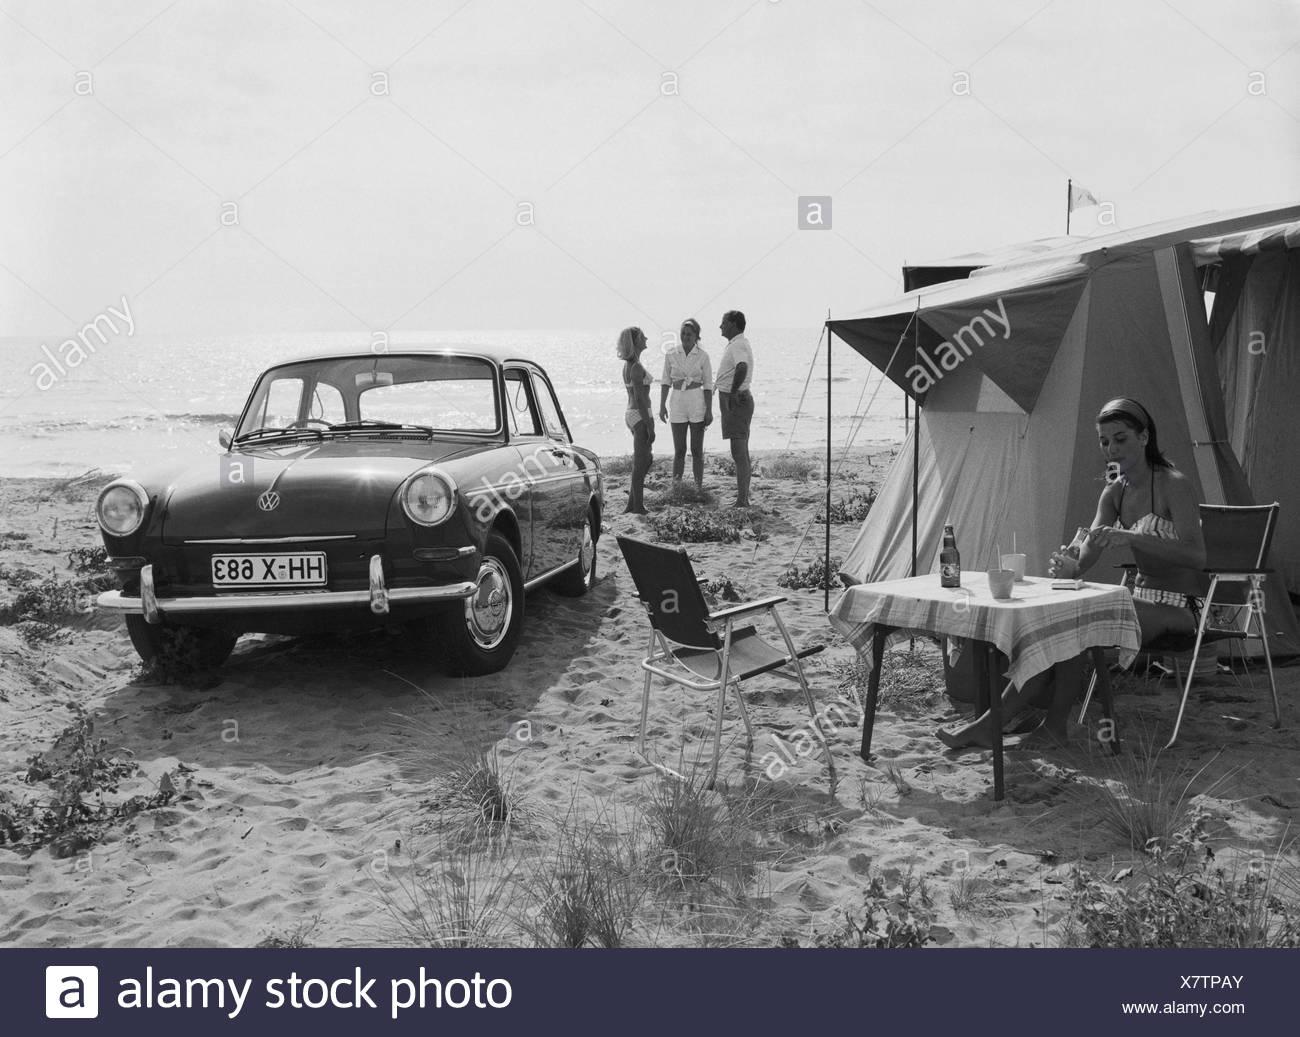 Sandy beach, leisure, tent, car, sea, holidays, - Stock Image